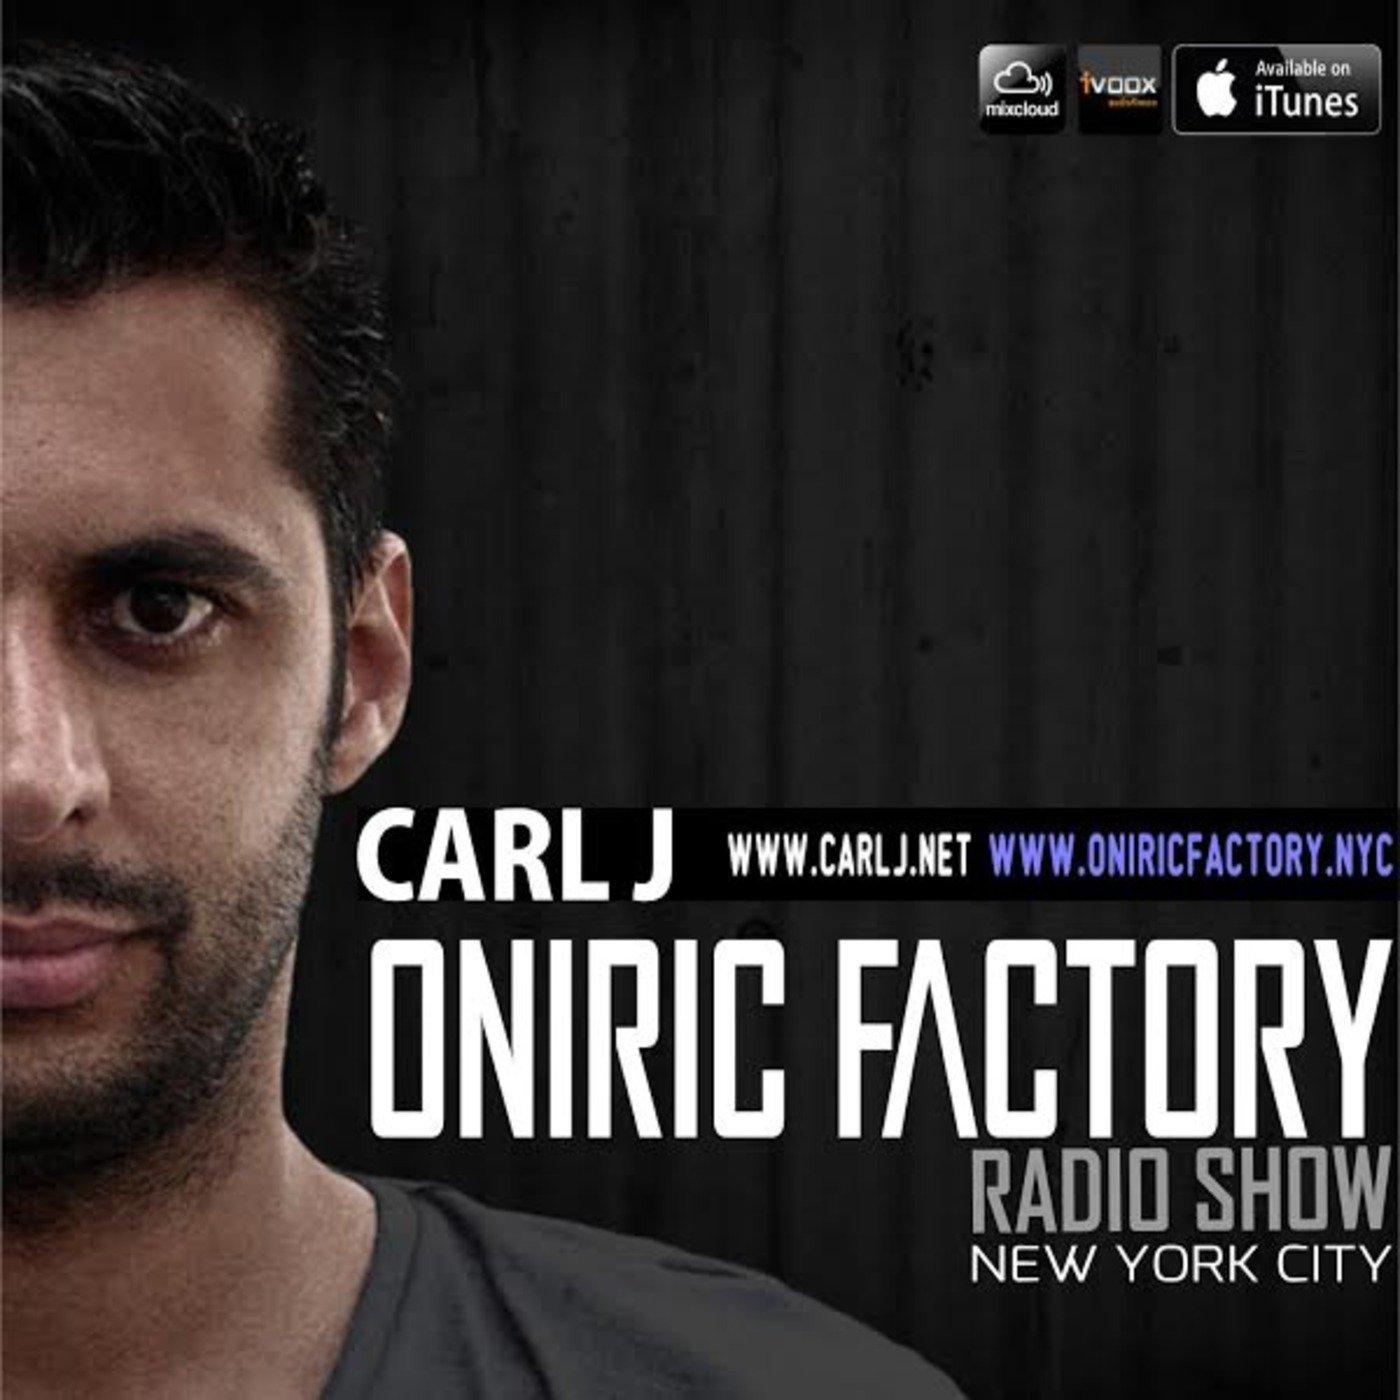 <![CDATA[Podcast de Oniric Factory Radio Show NYC]]>